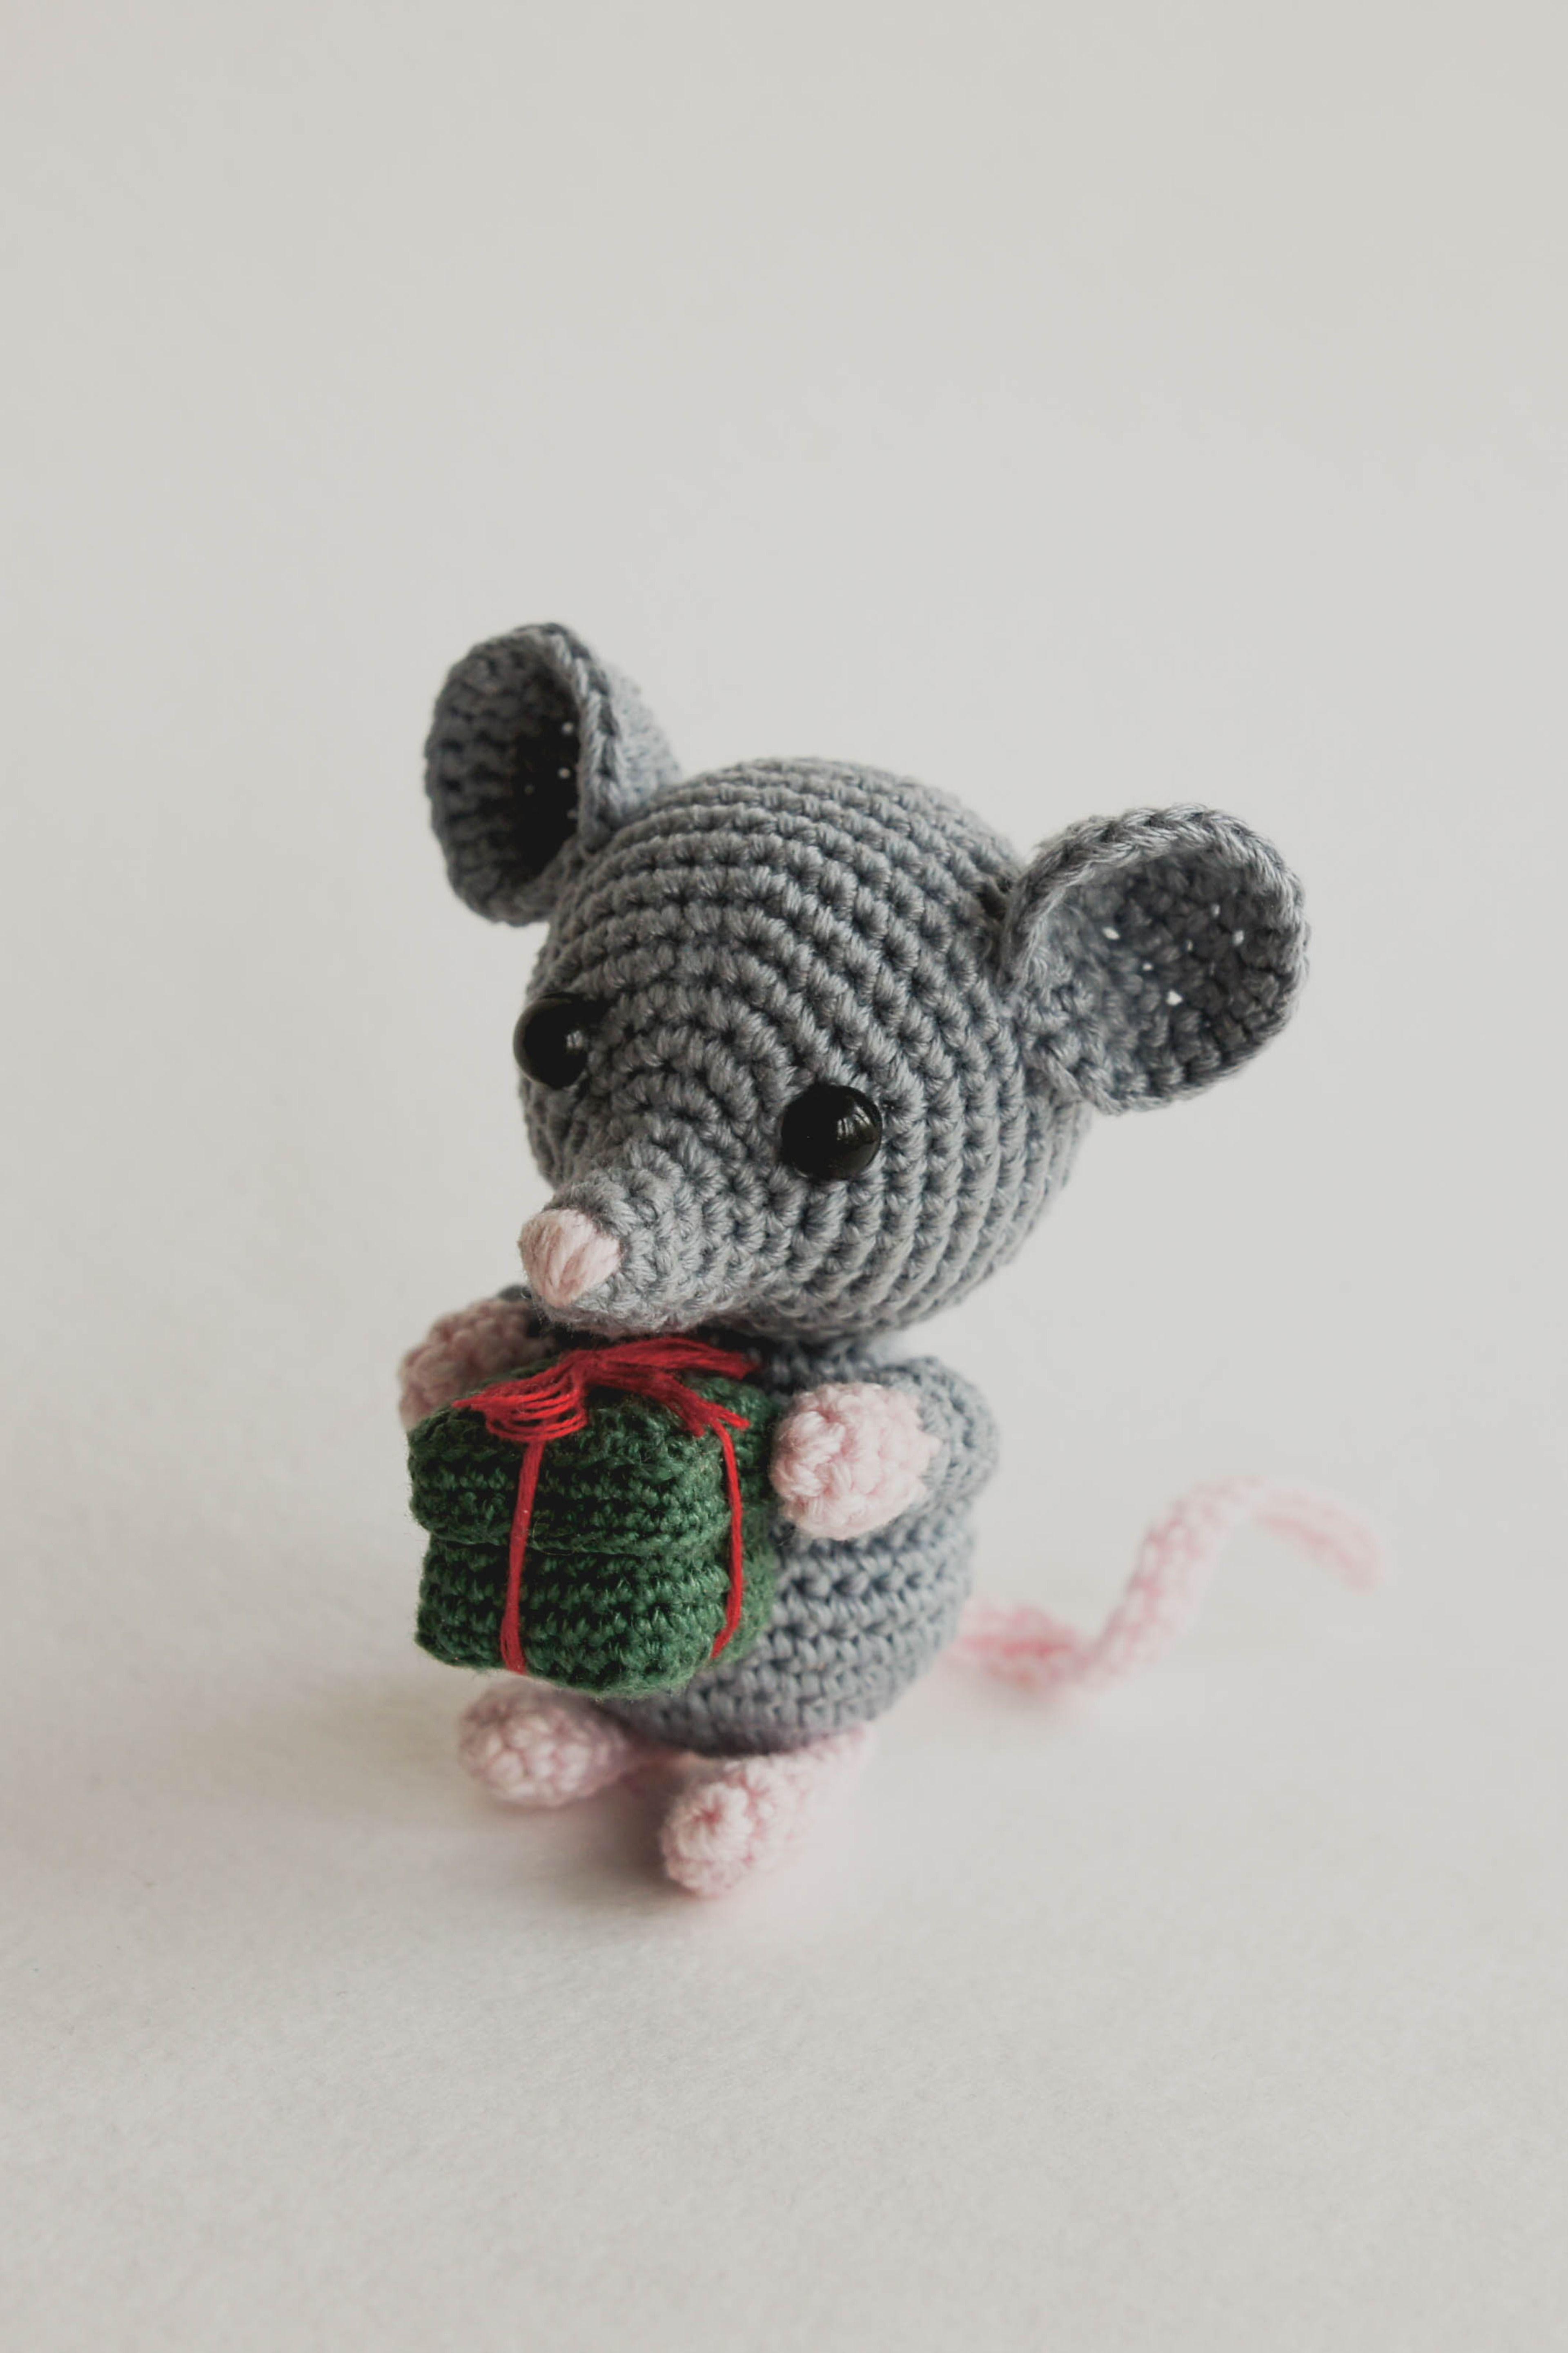 Tiny Mouse - Free amigurumi pattern   5761x3840